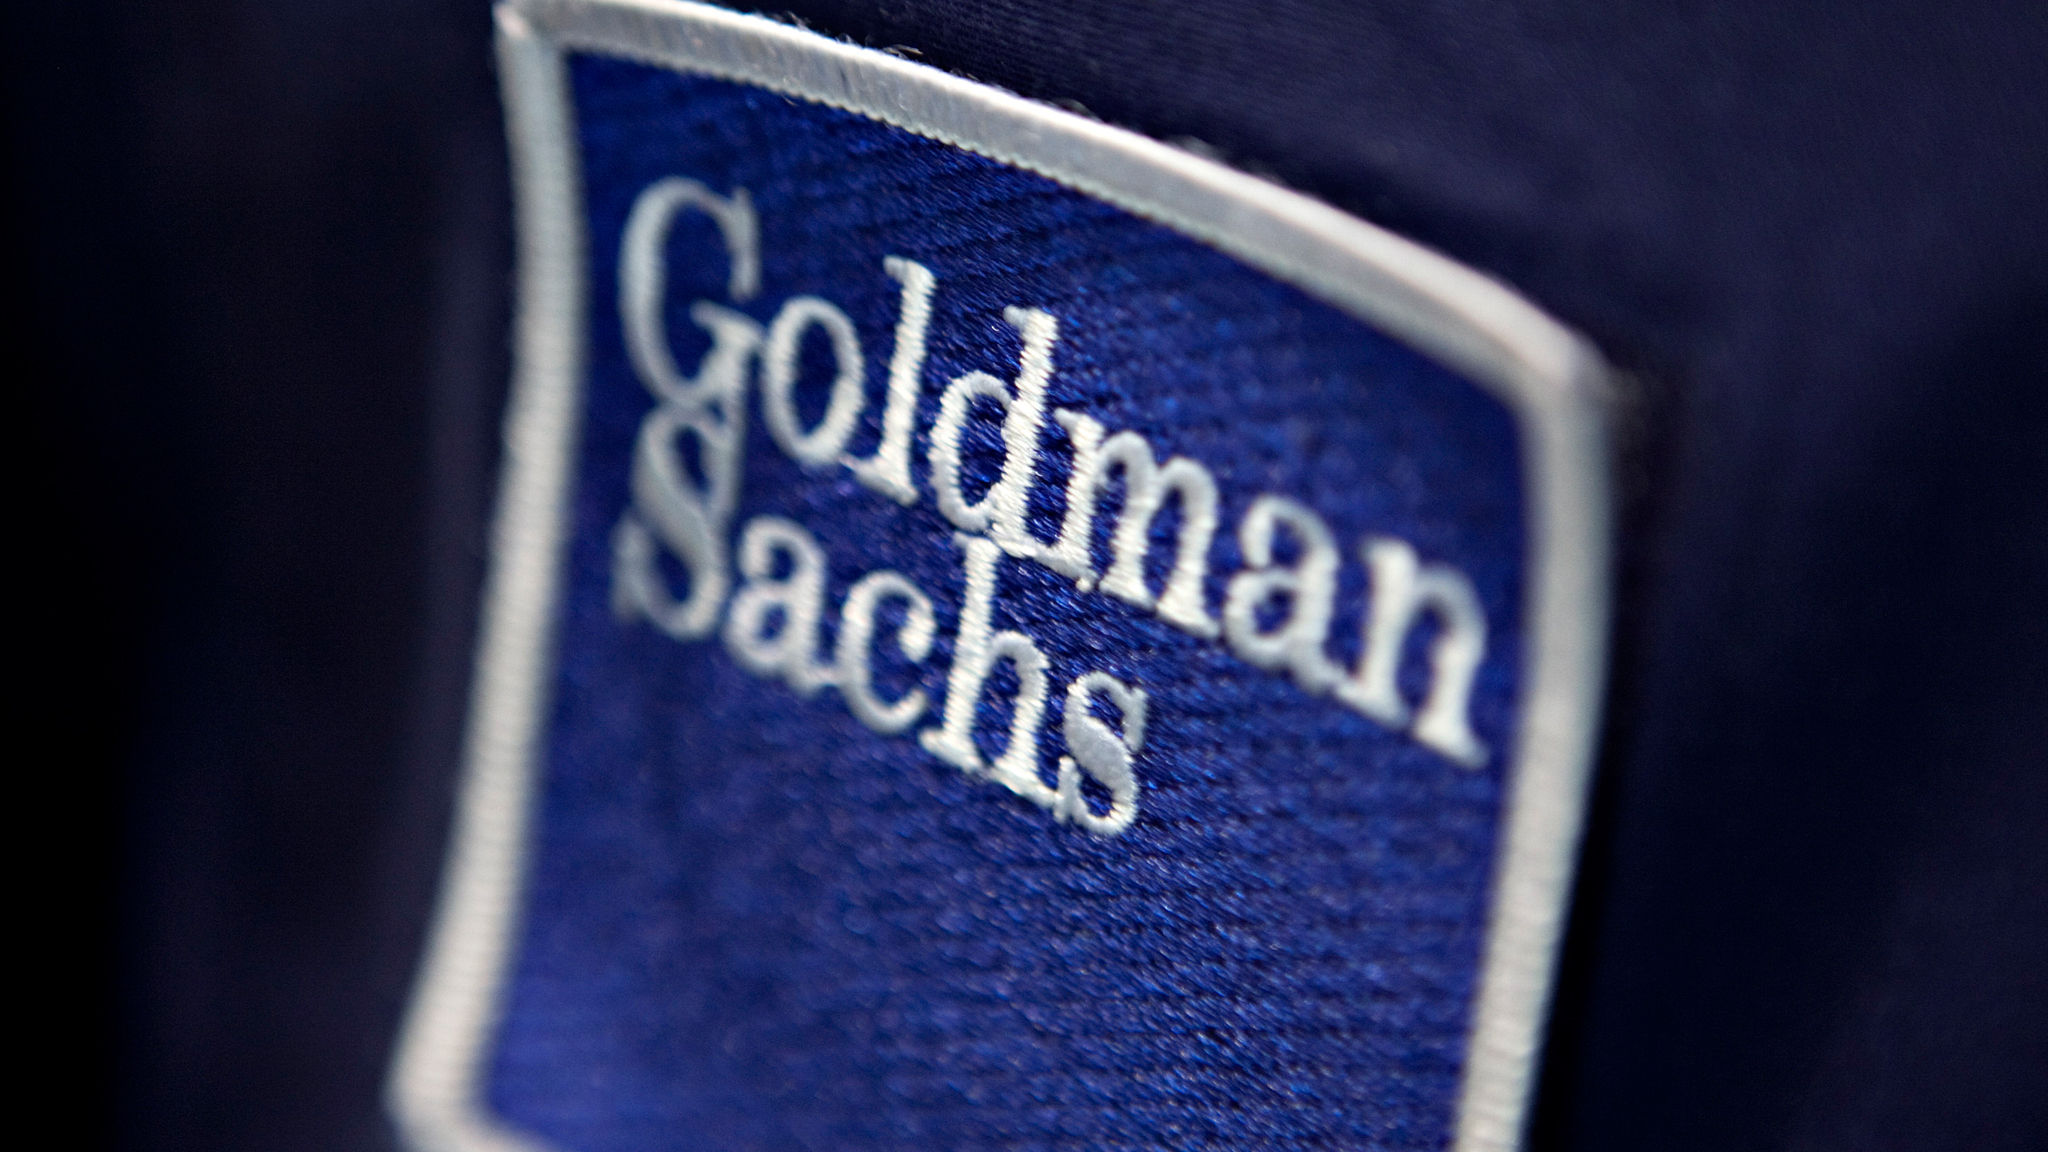 Goldman attracts 17,000 intern applicants | Financial Times